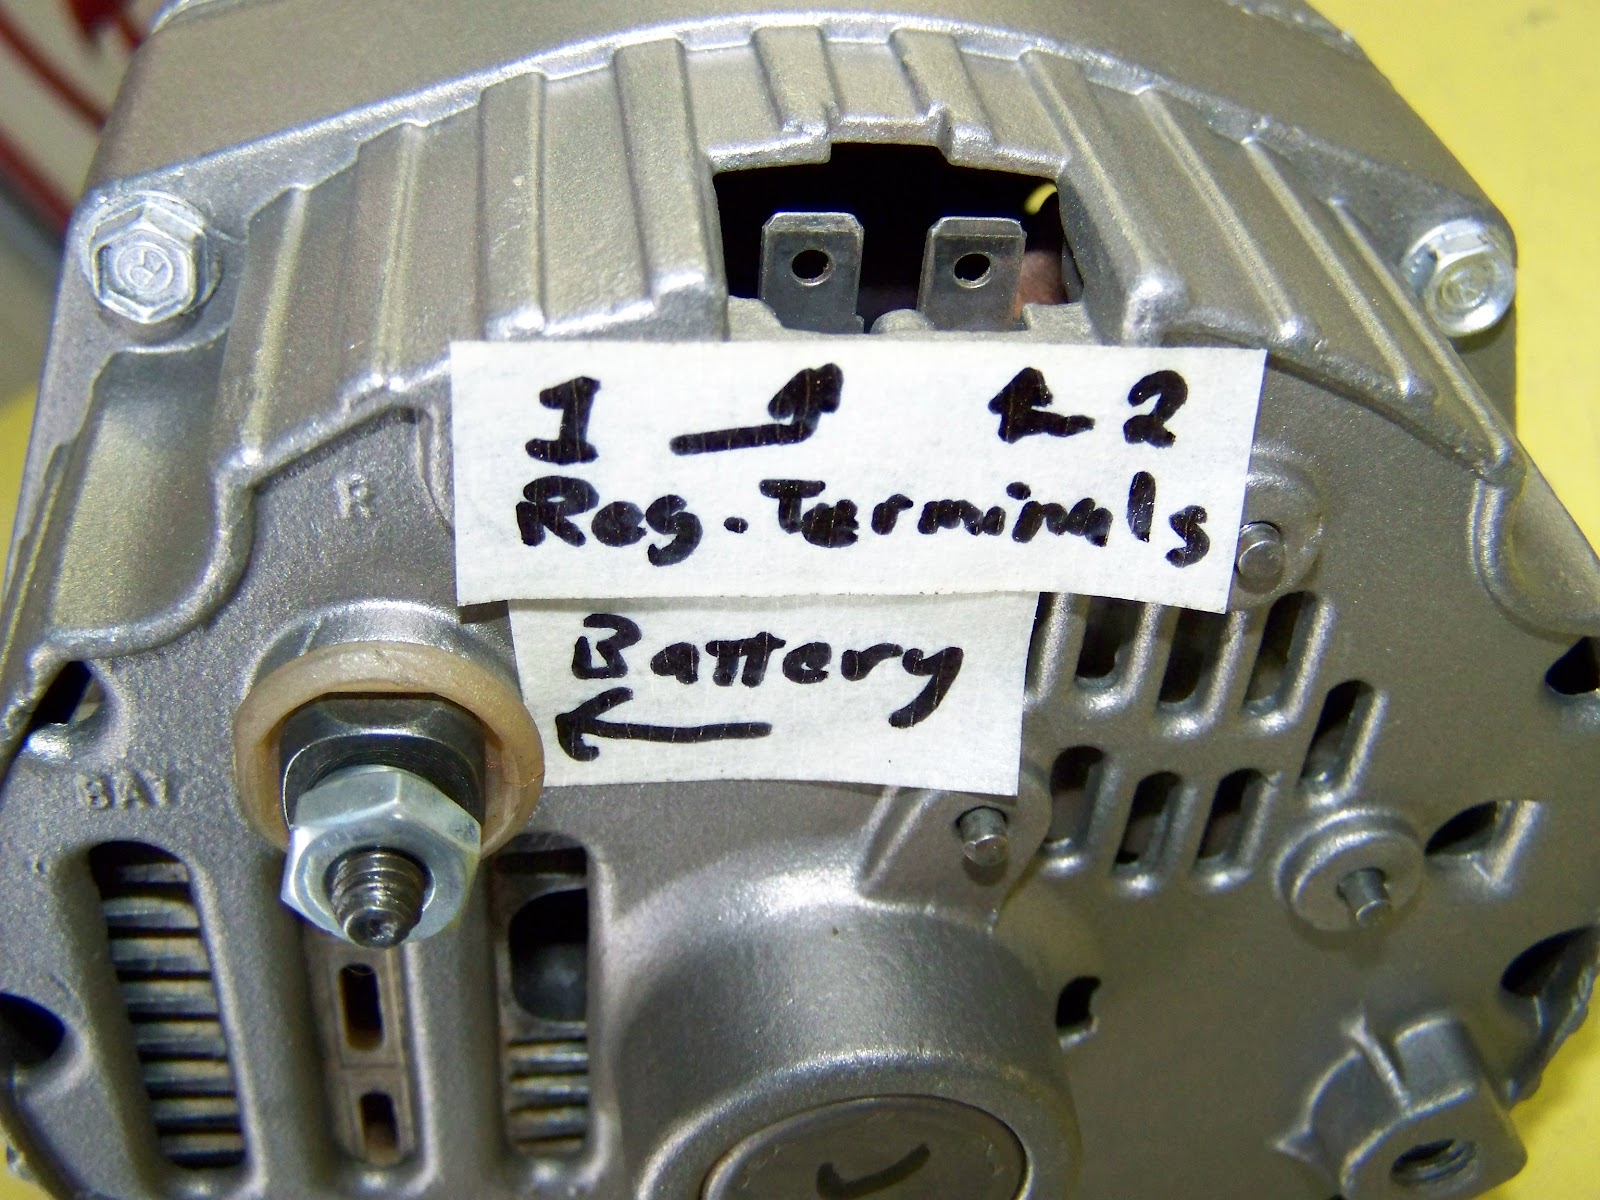 10si alternator wiring diagram maytag gas dryer parts warning light 3 wire